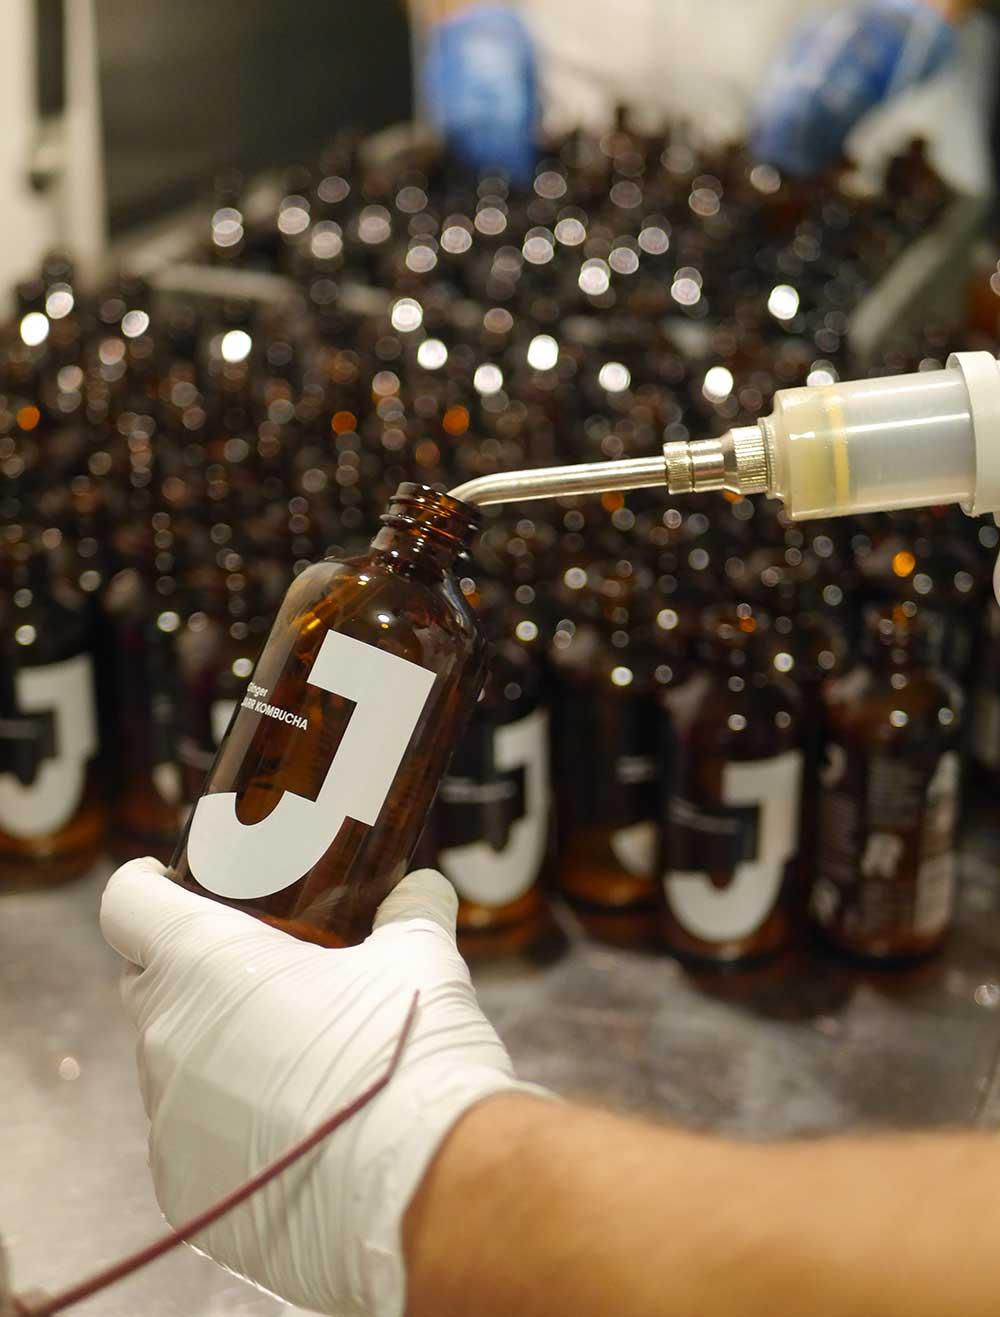 Bottles-Jar-Kombucha-web-ready.jpg